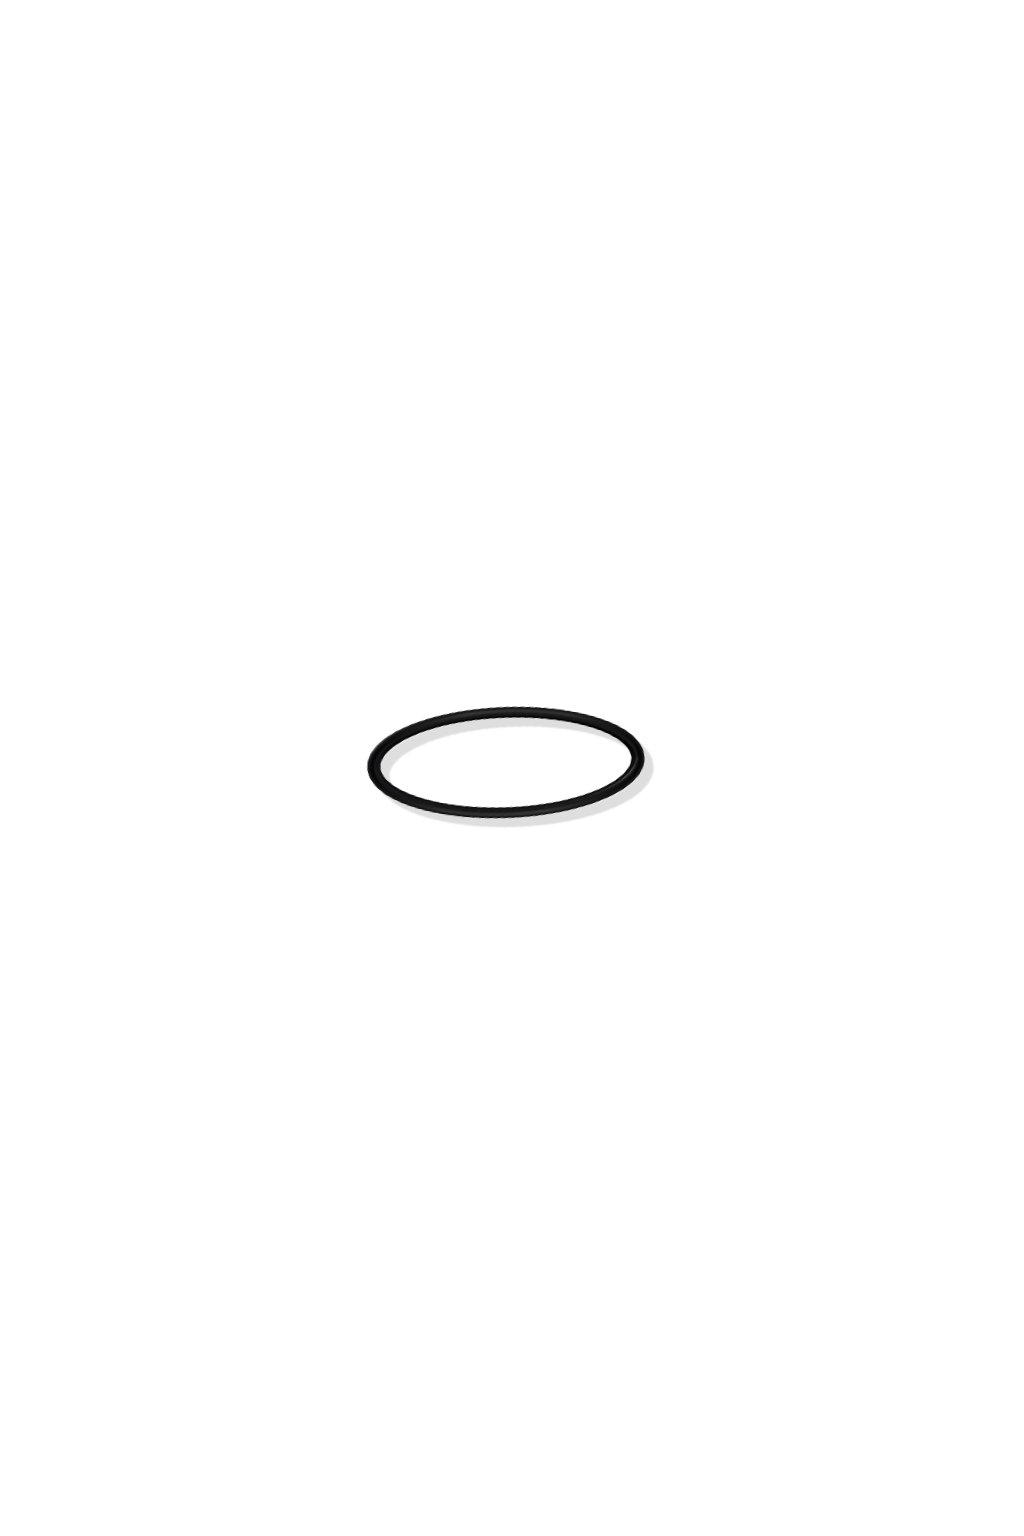 O-Kroužek 15.8x1.1 - FT4/7